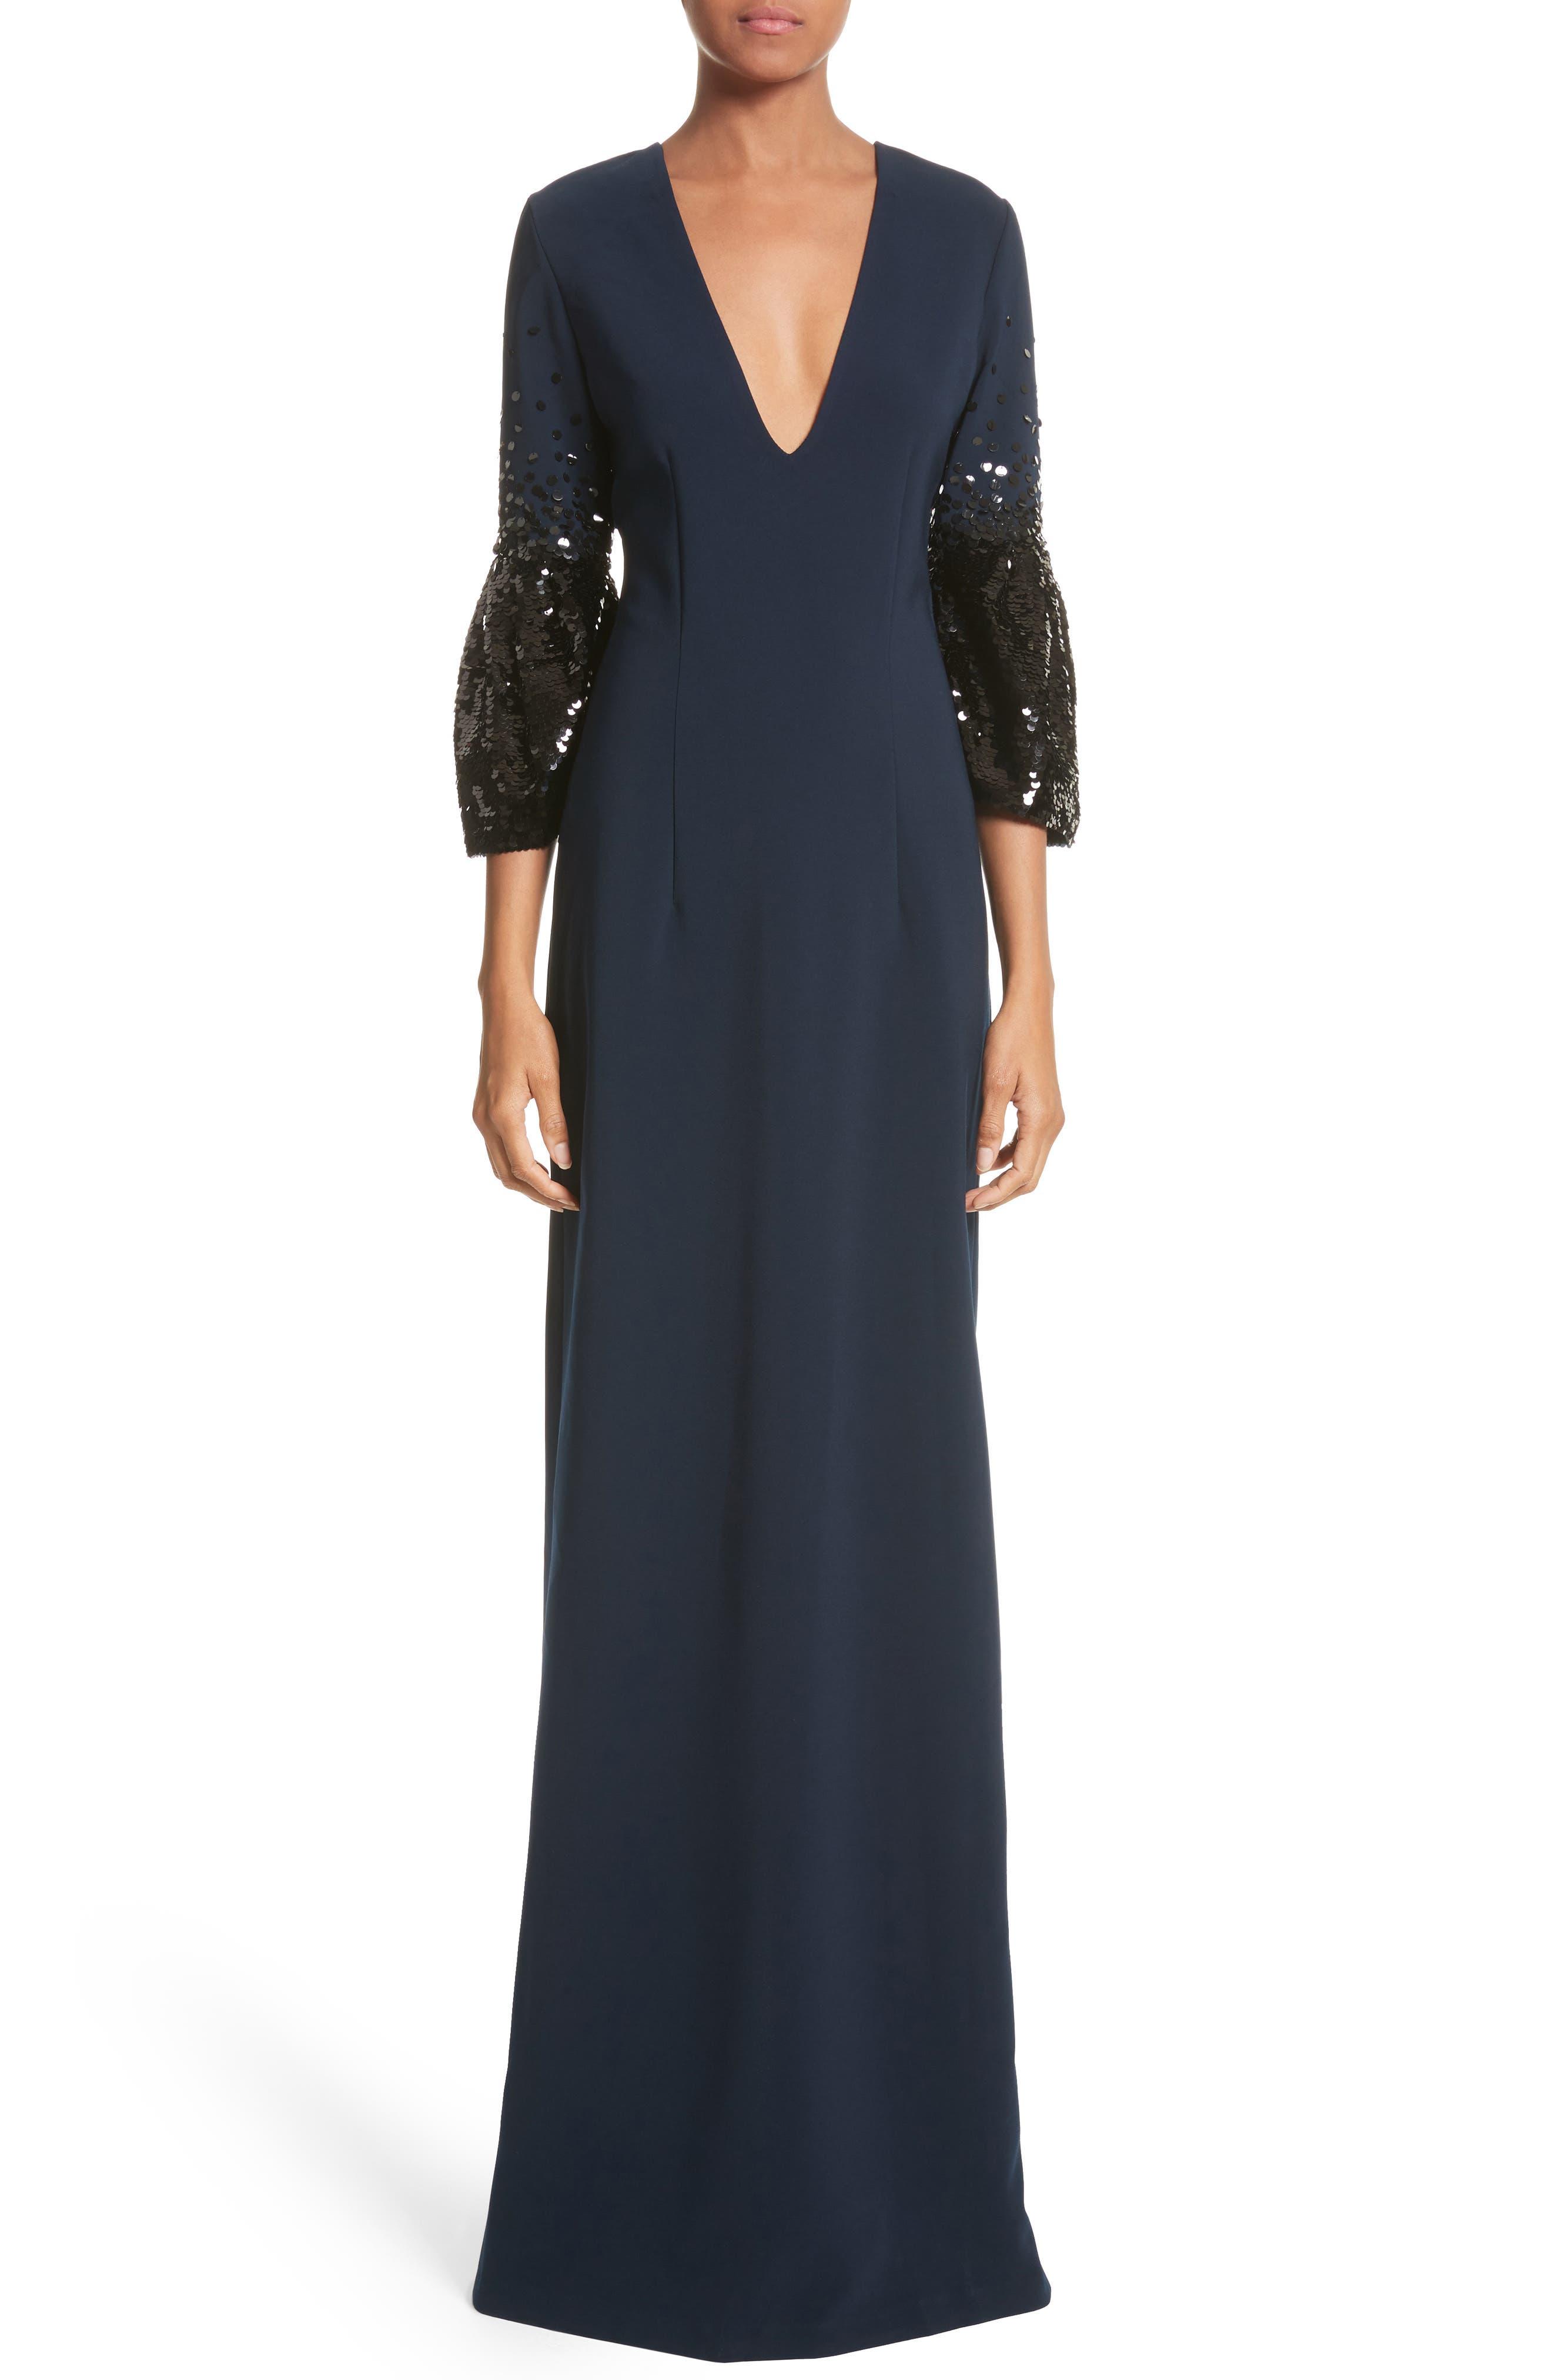 Main Image - Sachin & Babi Noir Tower Embellished Sleeve Gown